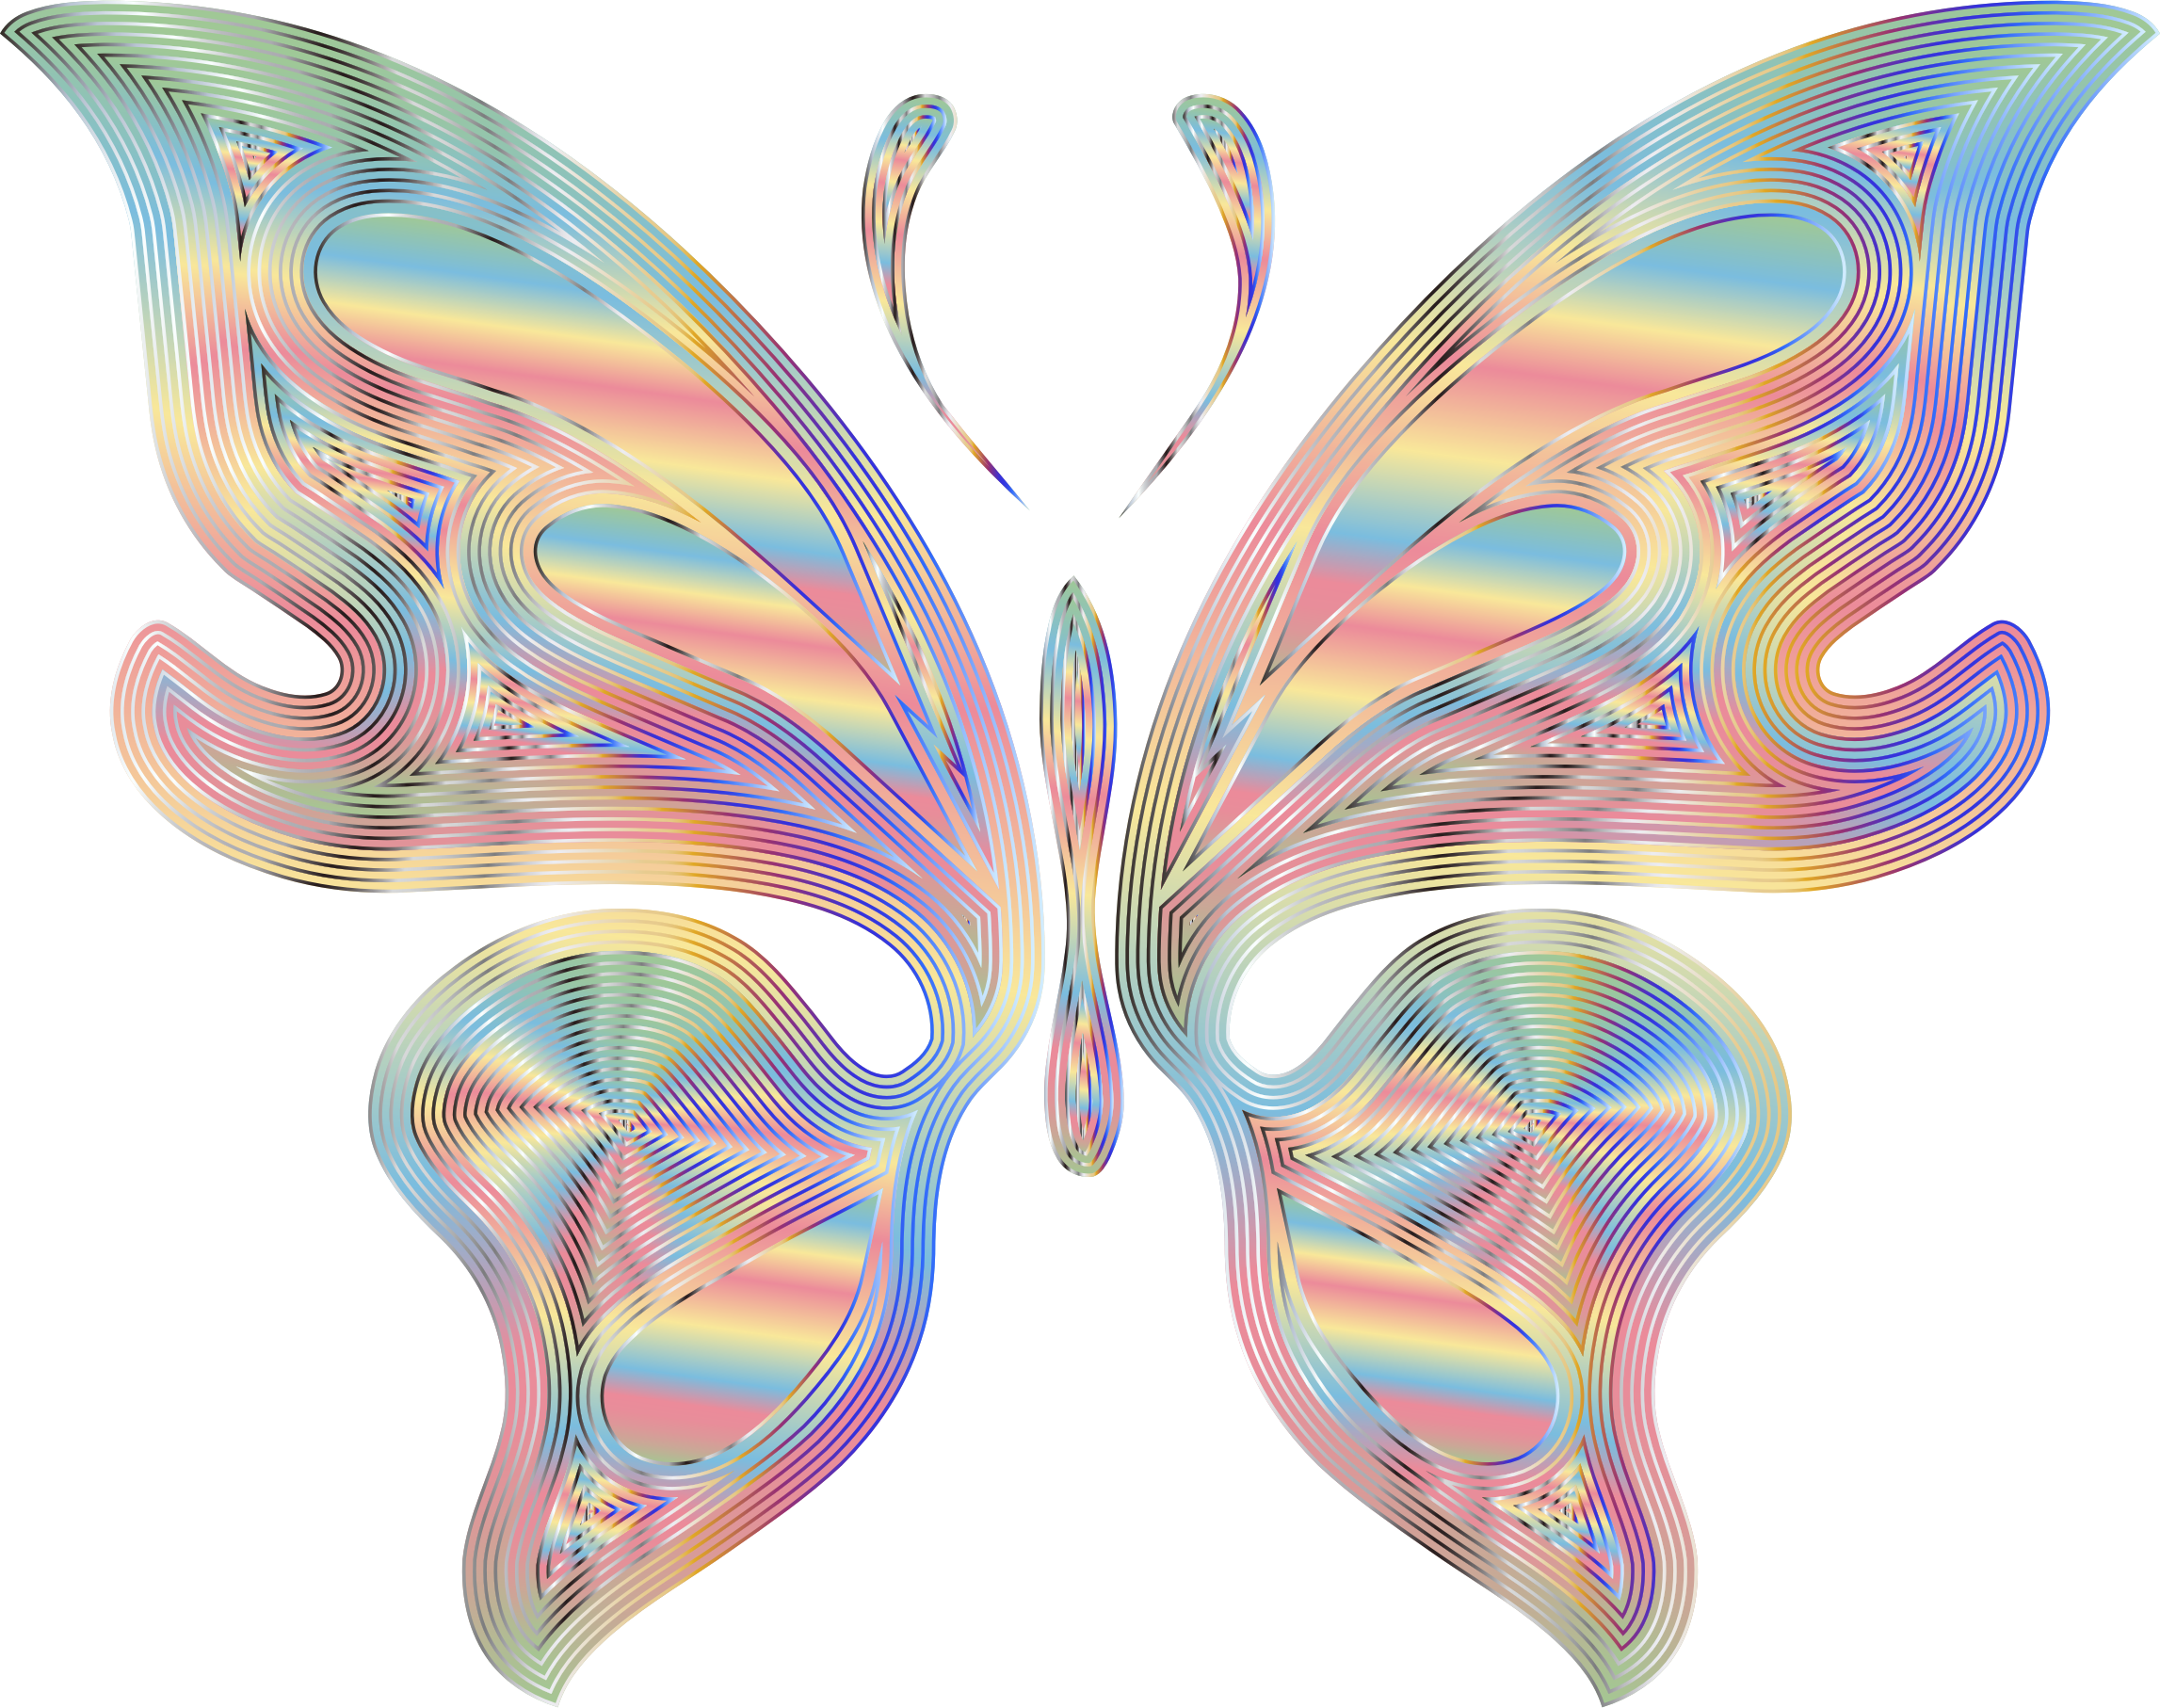 Clipart butterfly transparent background. Prismatic variation no big